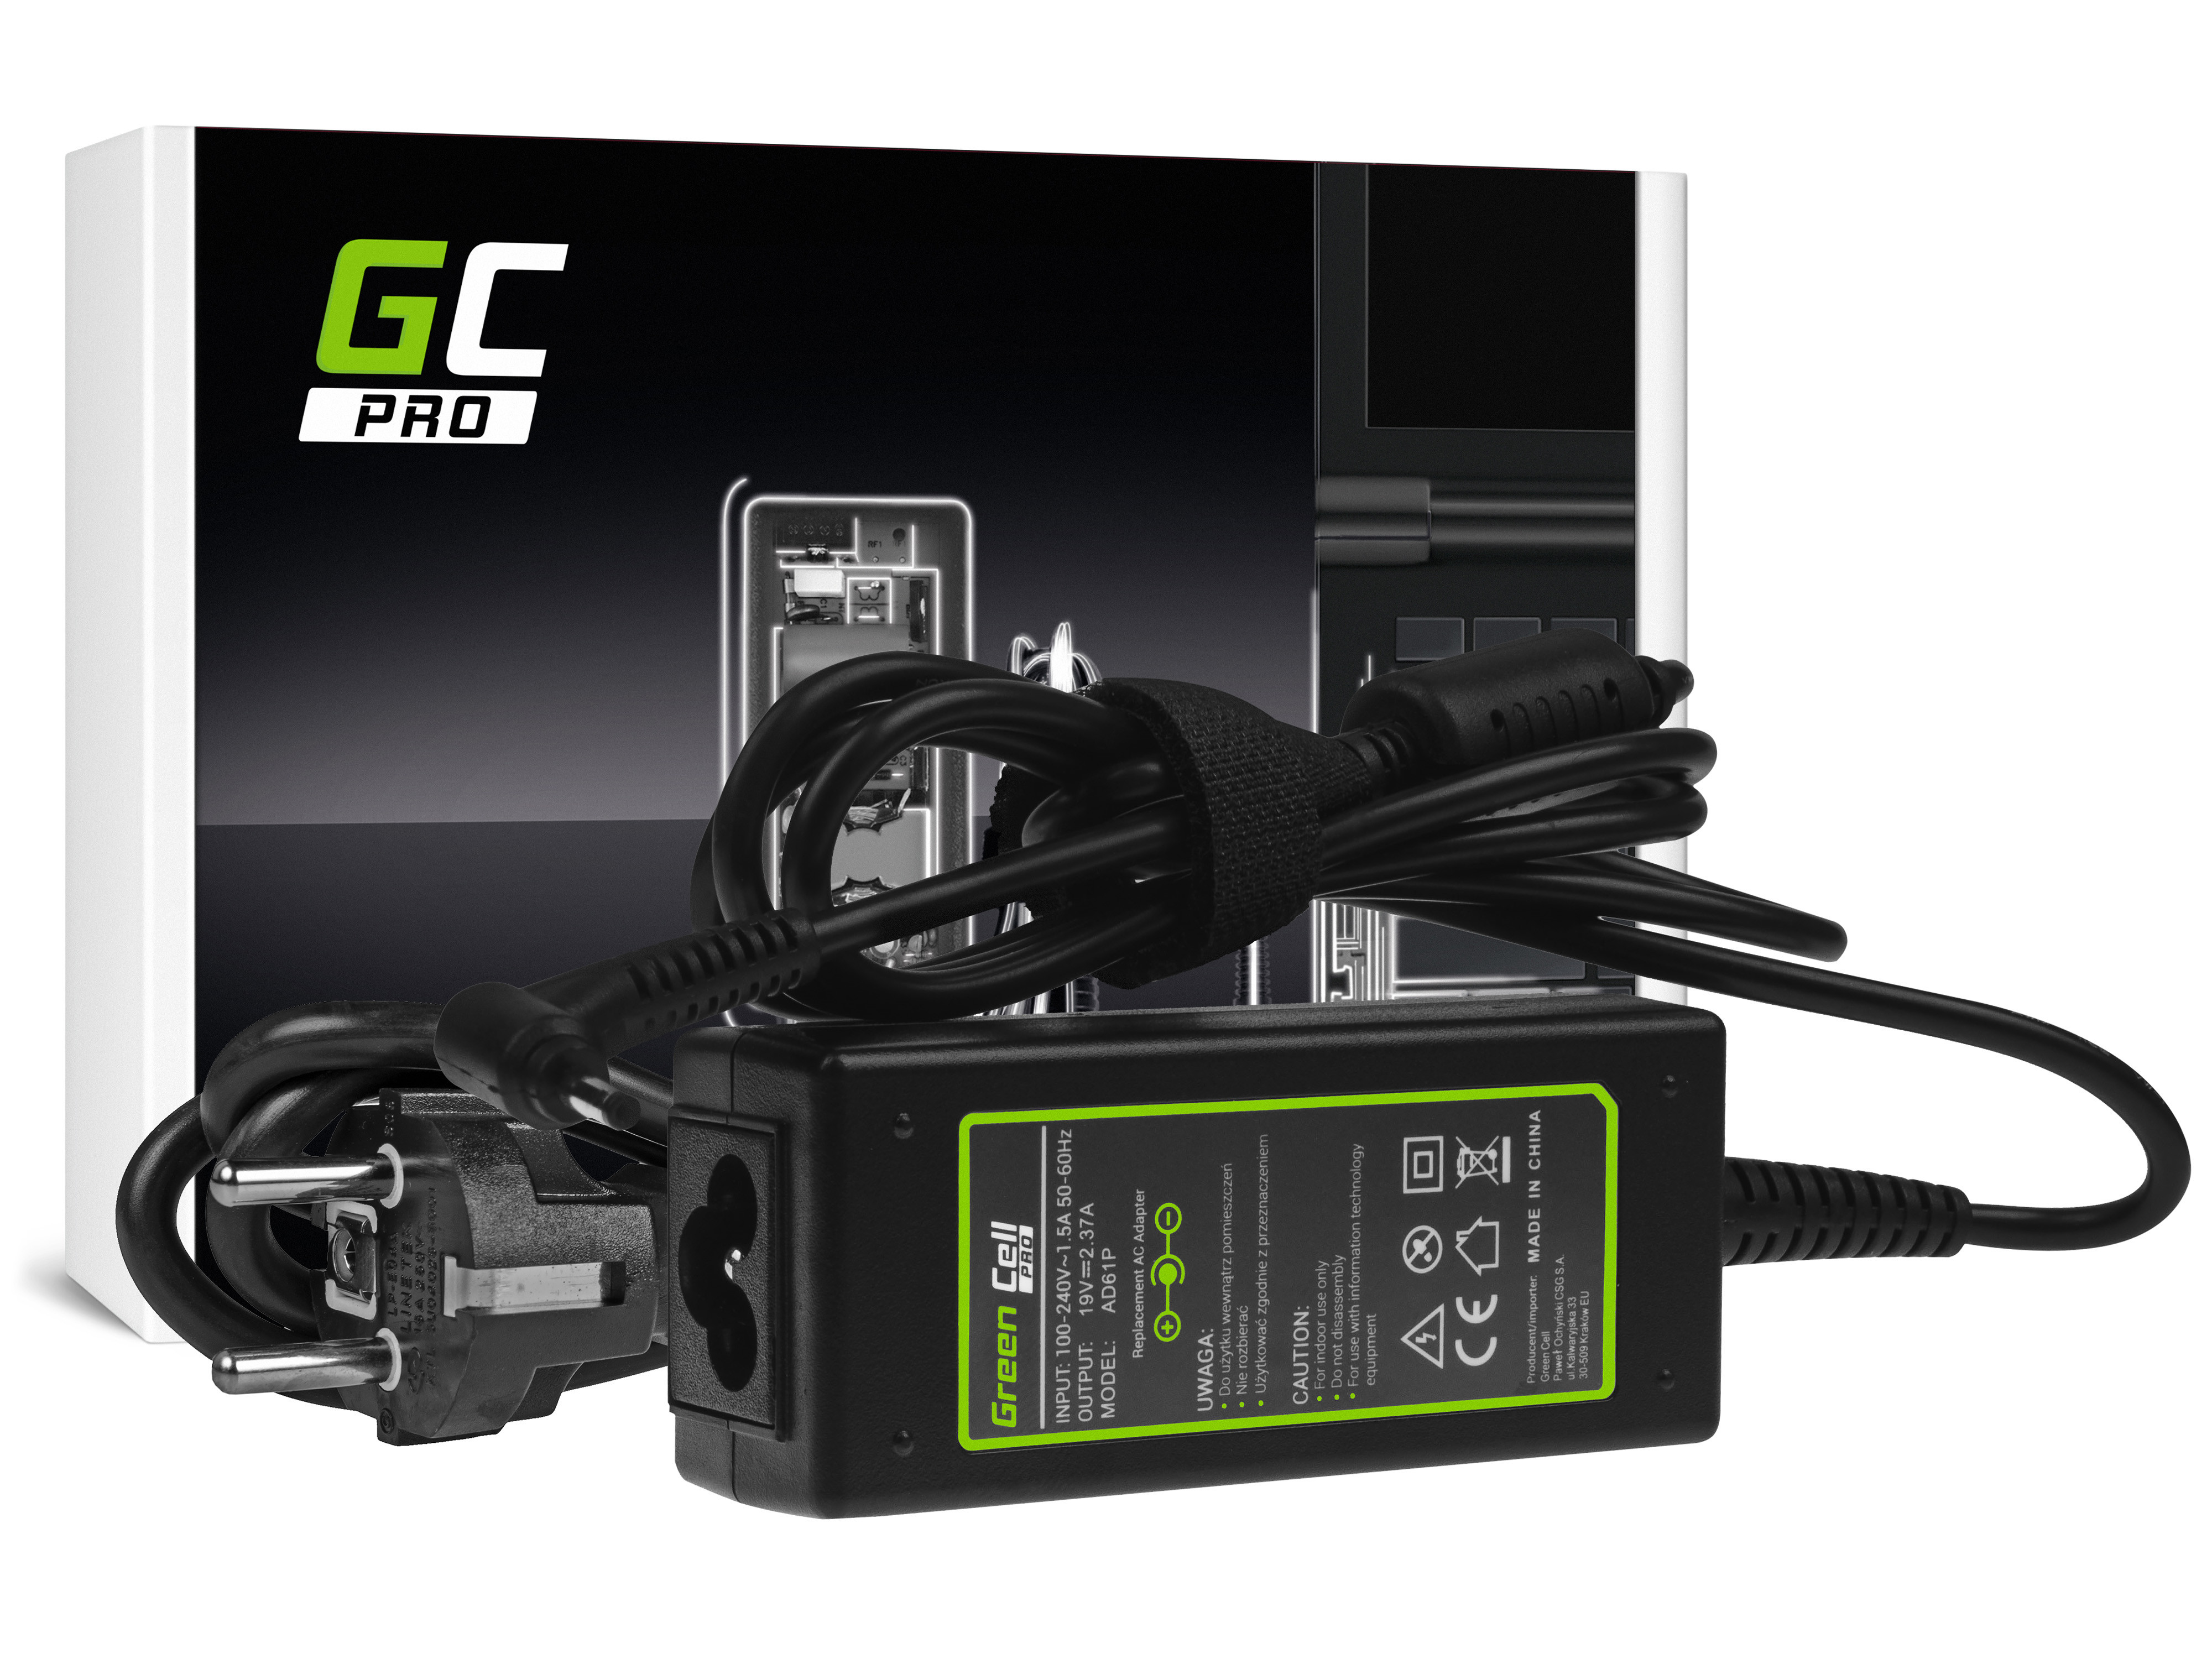 Green Cell AD61P Adaptér Nabíječka Asus ZenBook UX21E UX31E, Acer Chromebook 11 CB3-111 13 CB5-311 19V 2.37A 45W